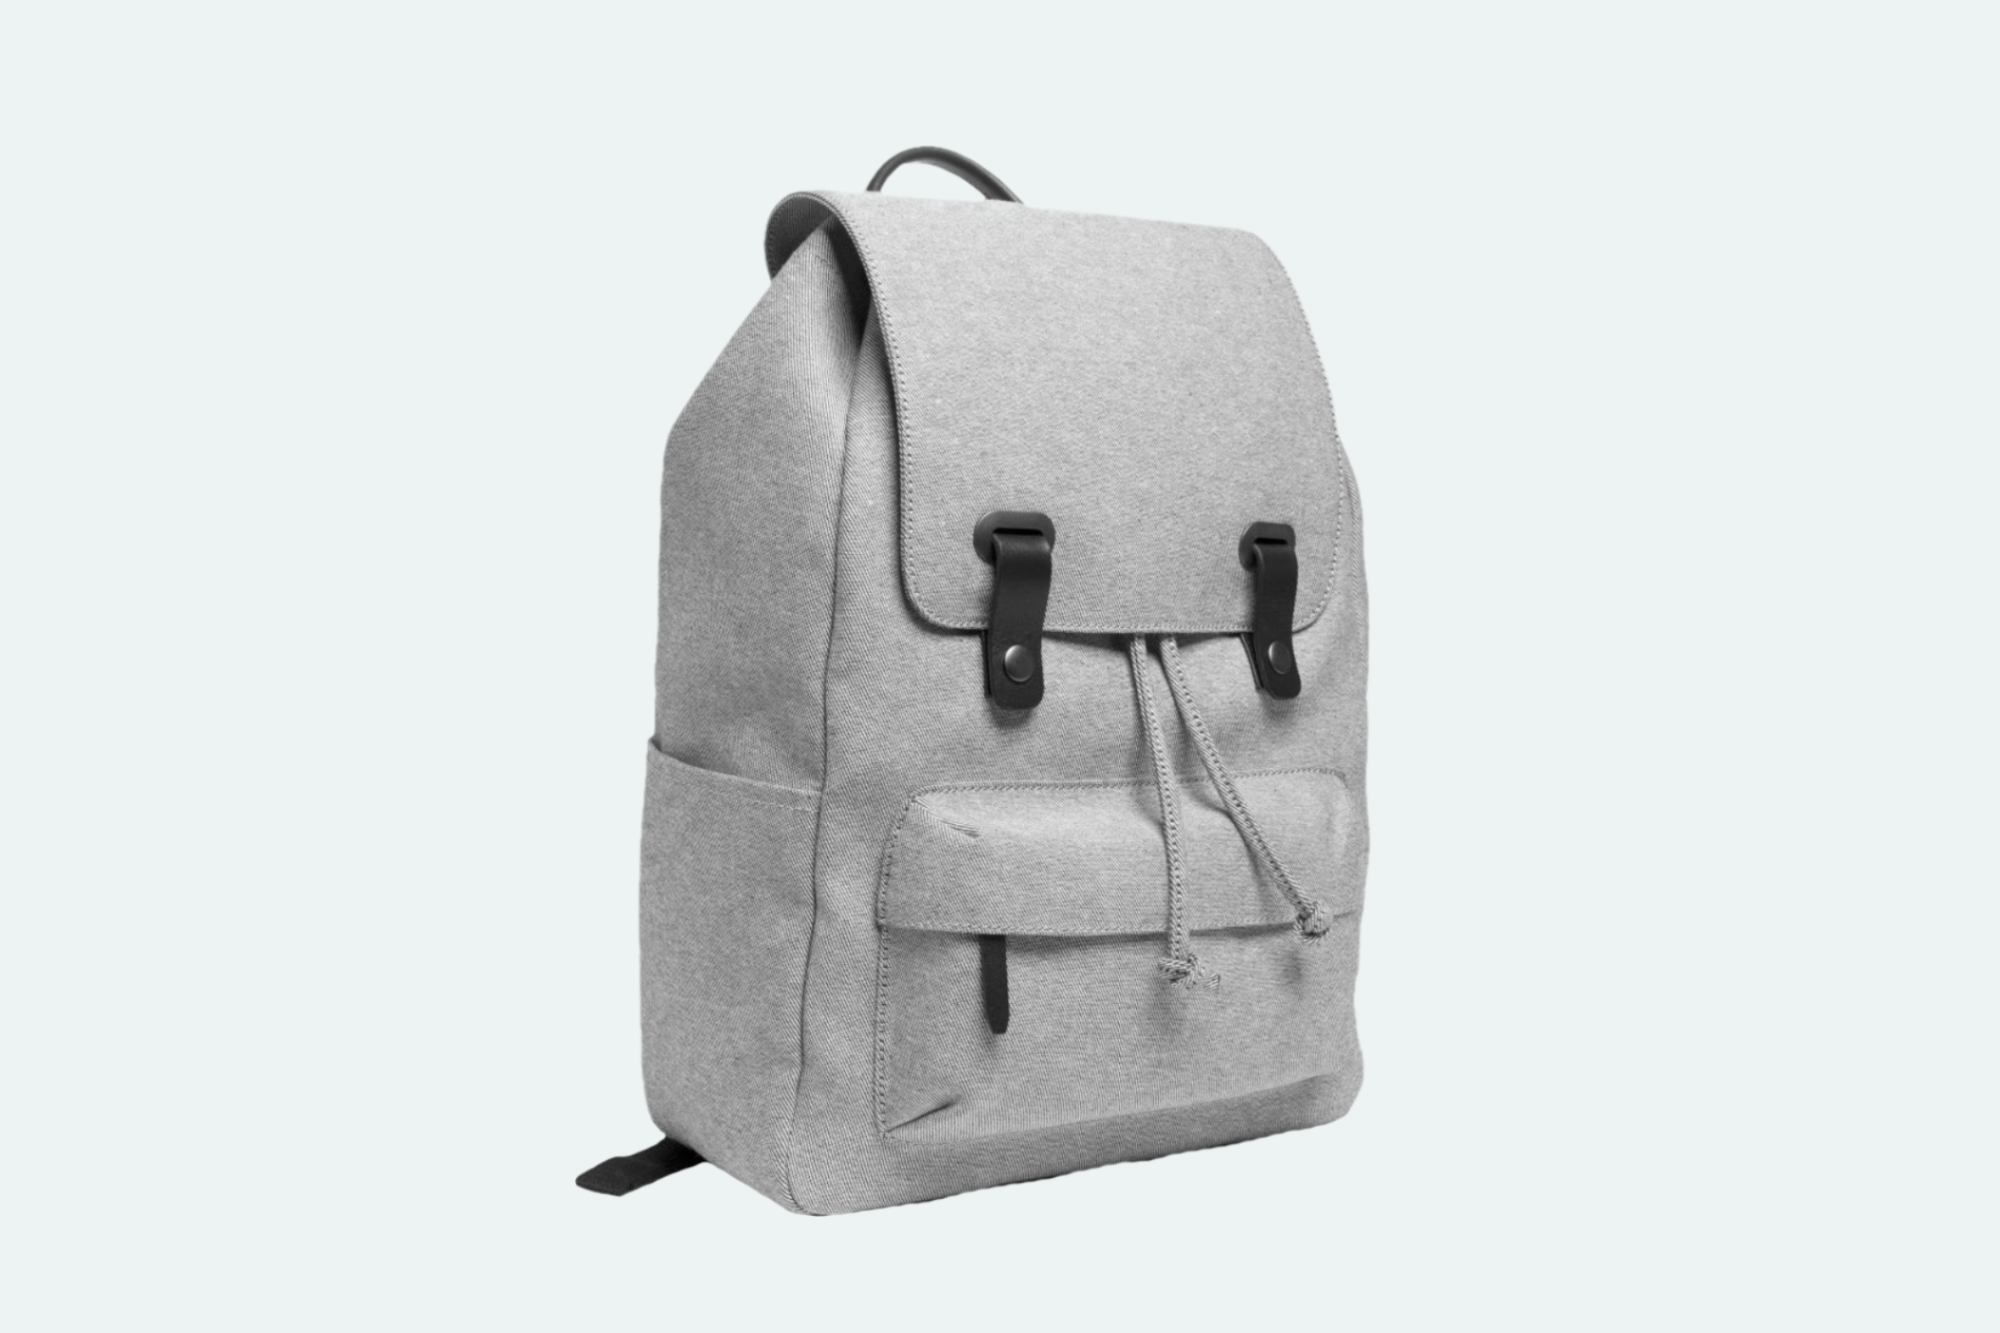 11b6604faf24 The Best Backpacks